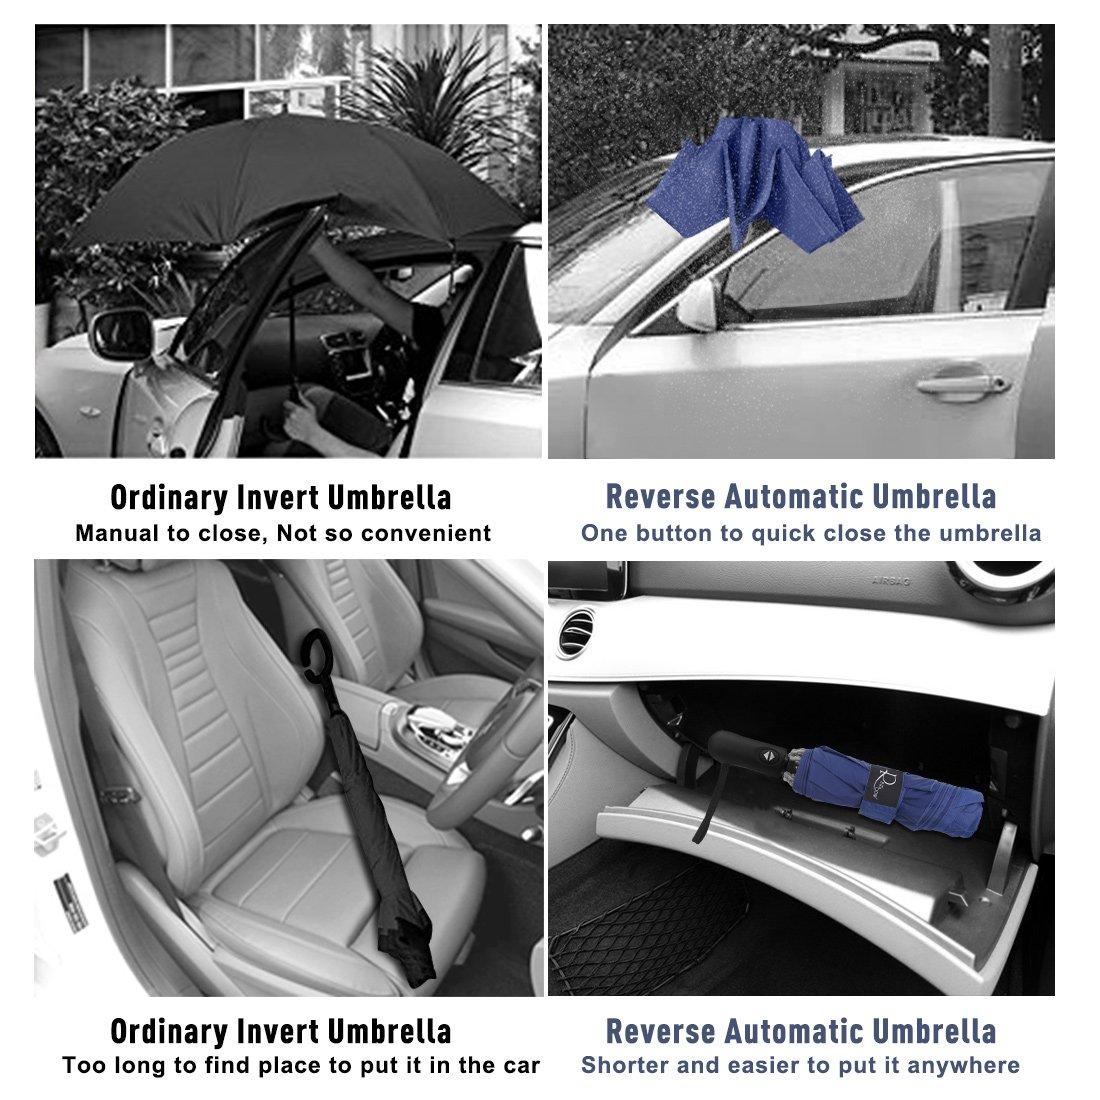 Nesus Umbrella Windproof Travel Umbrella 8 Ribs Auto Open Close with Waterproof Canopy Compact Folding Reverse Umbrella(Blue) by Nesus (Image #7)